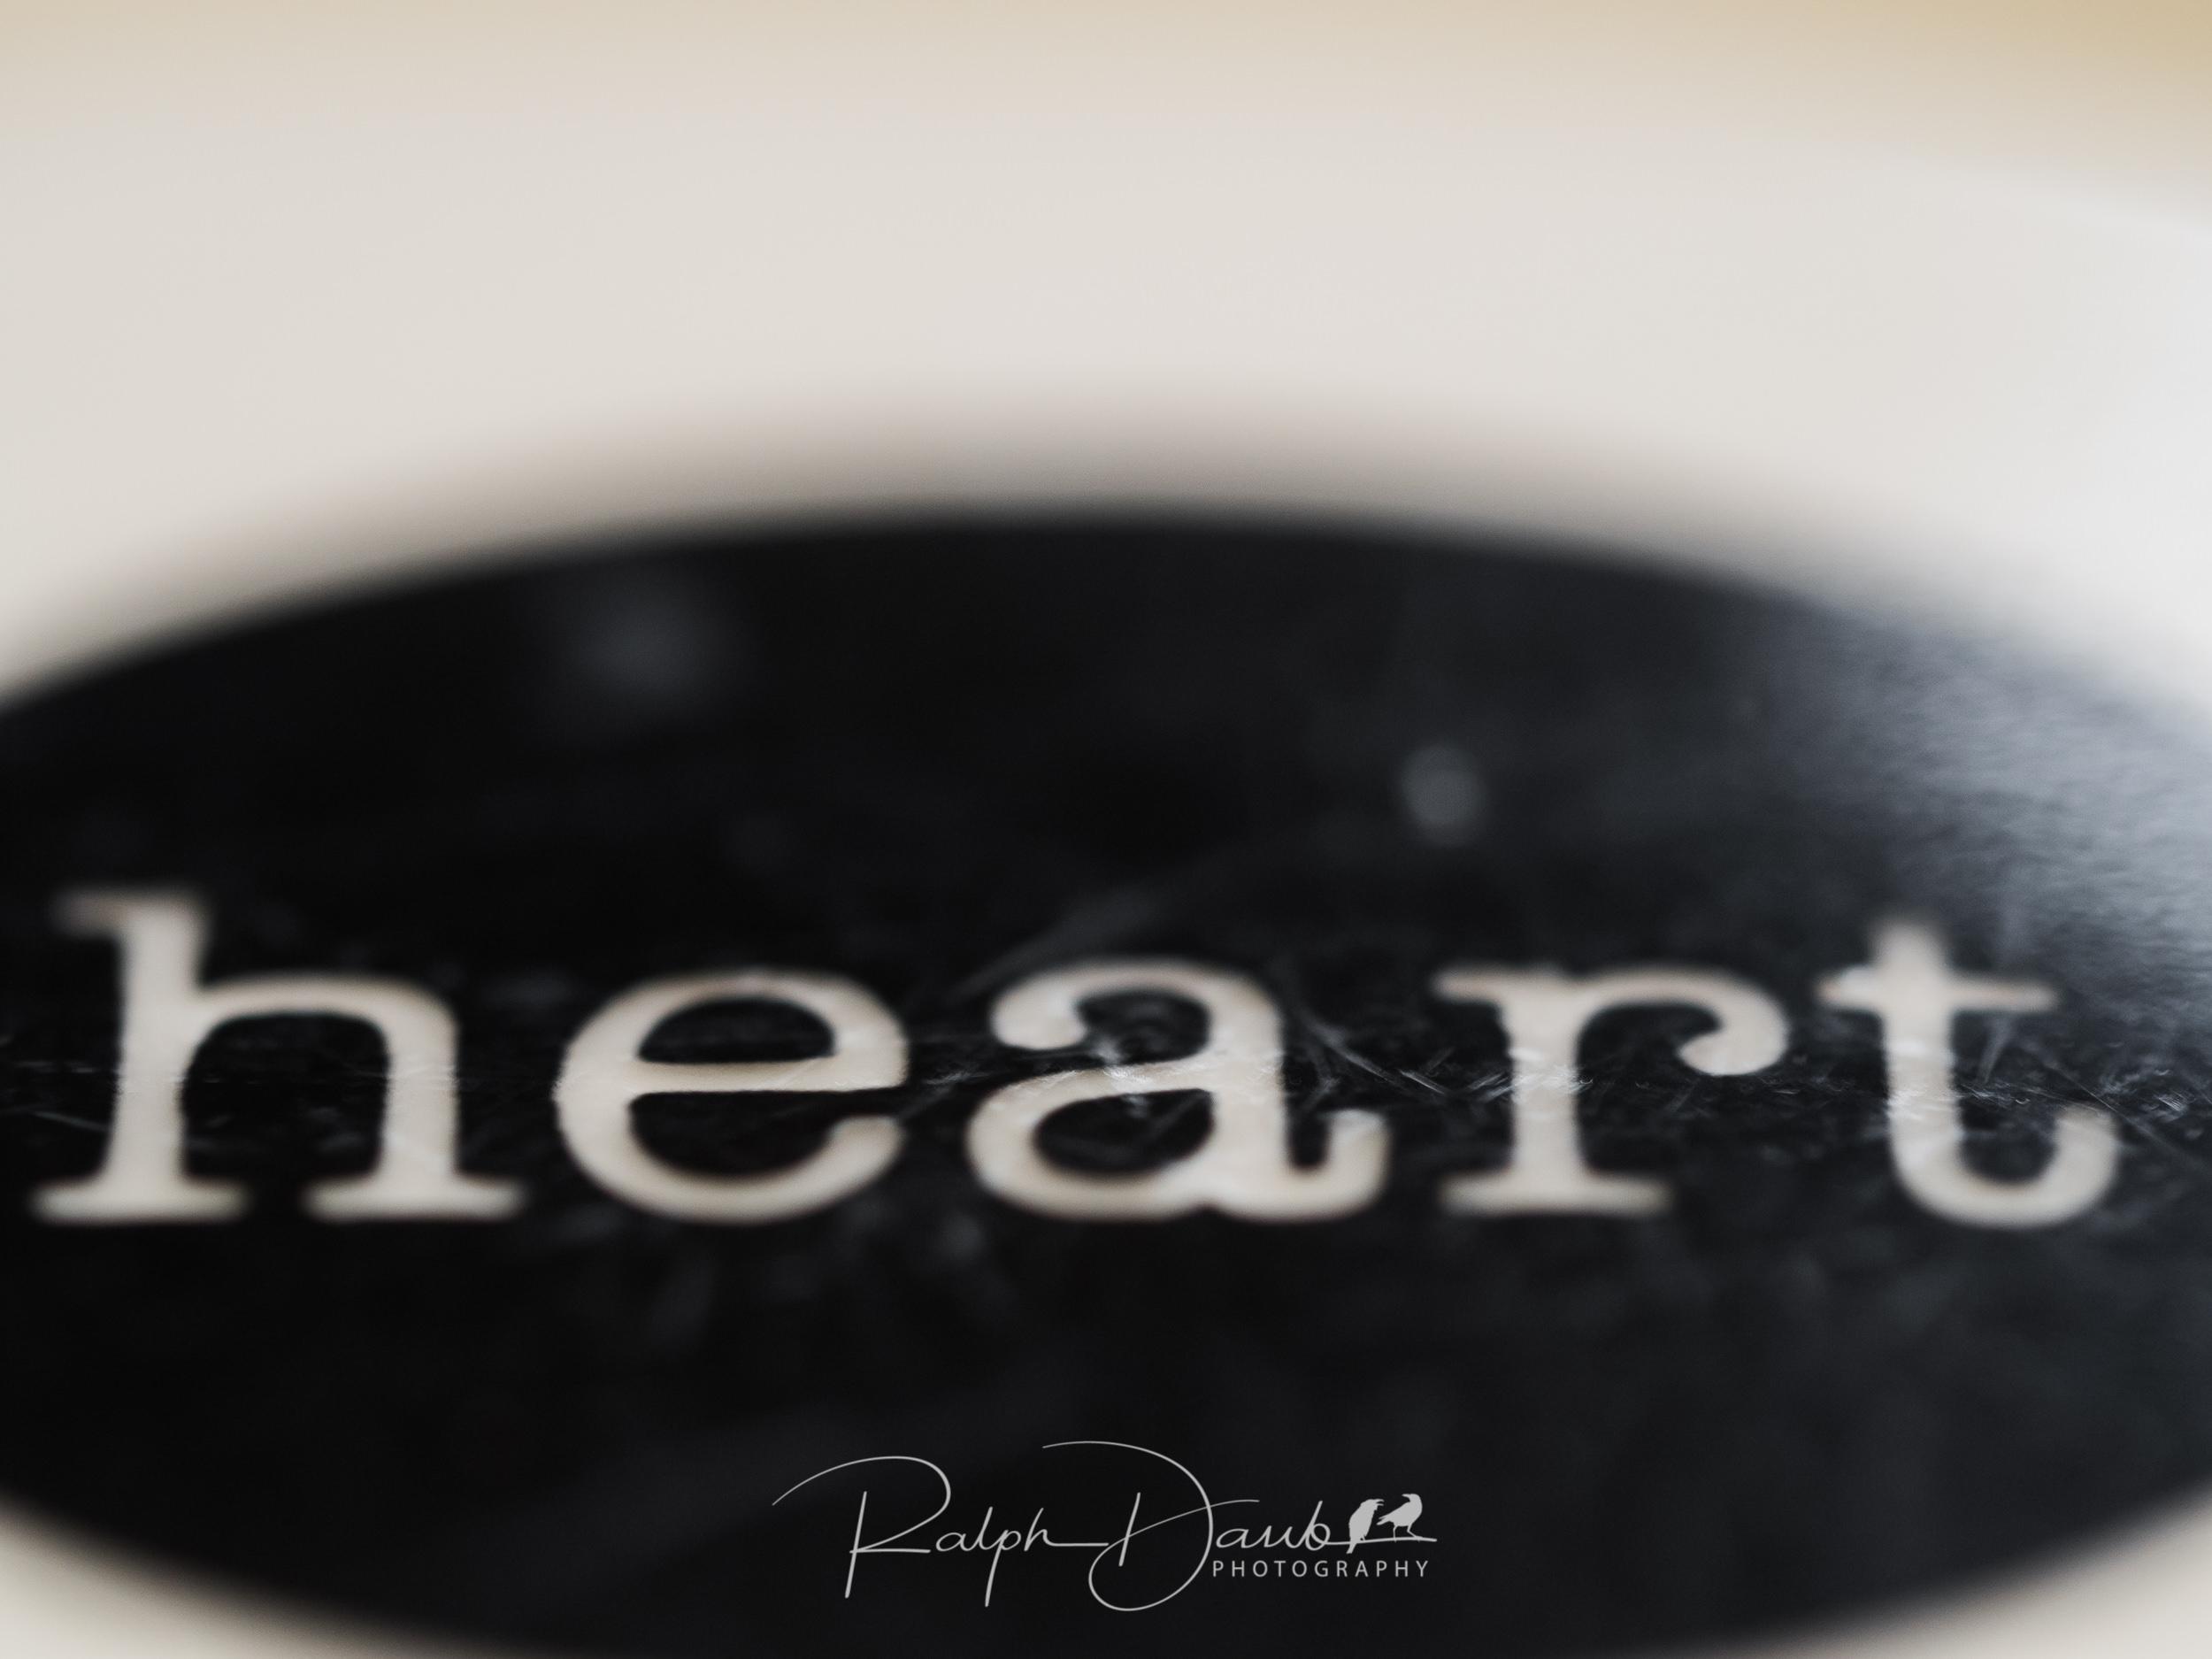 Heart Coffee, Portland, Oregon